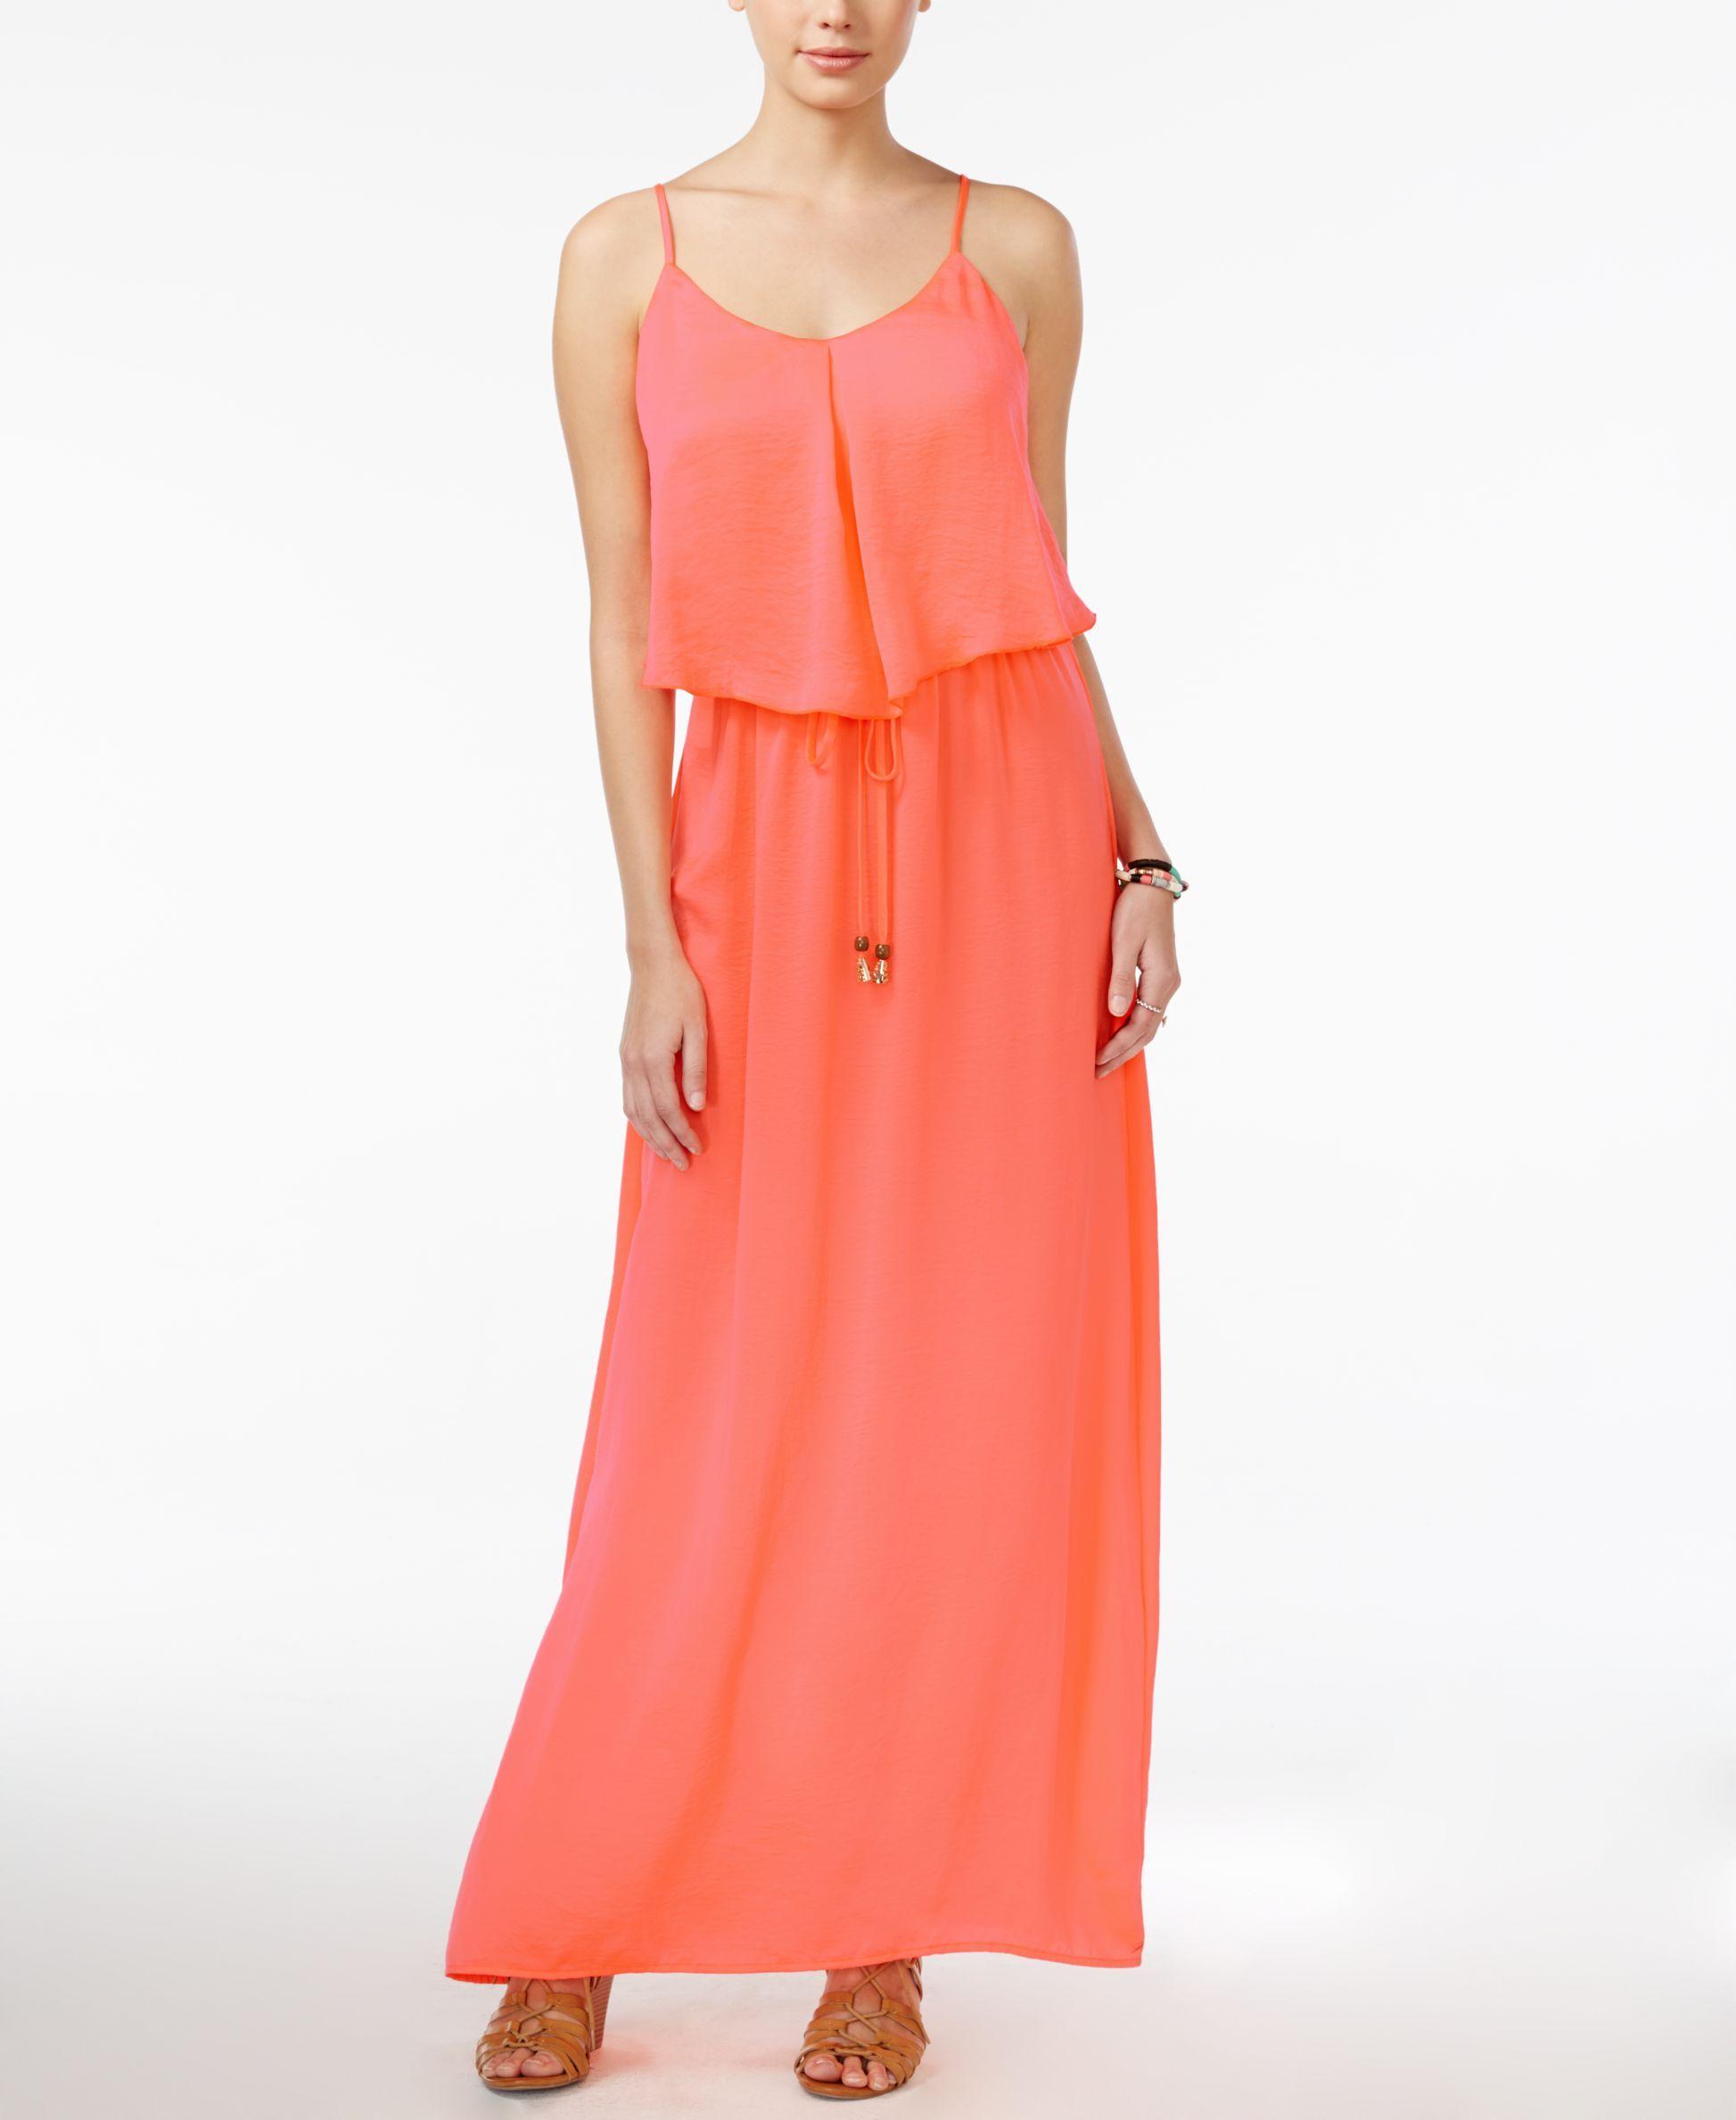 City studiosu juniorsu sleeveless popover maxi dress products